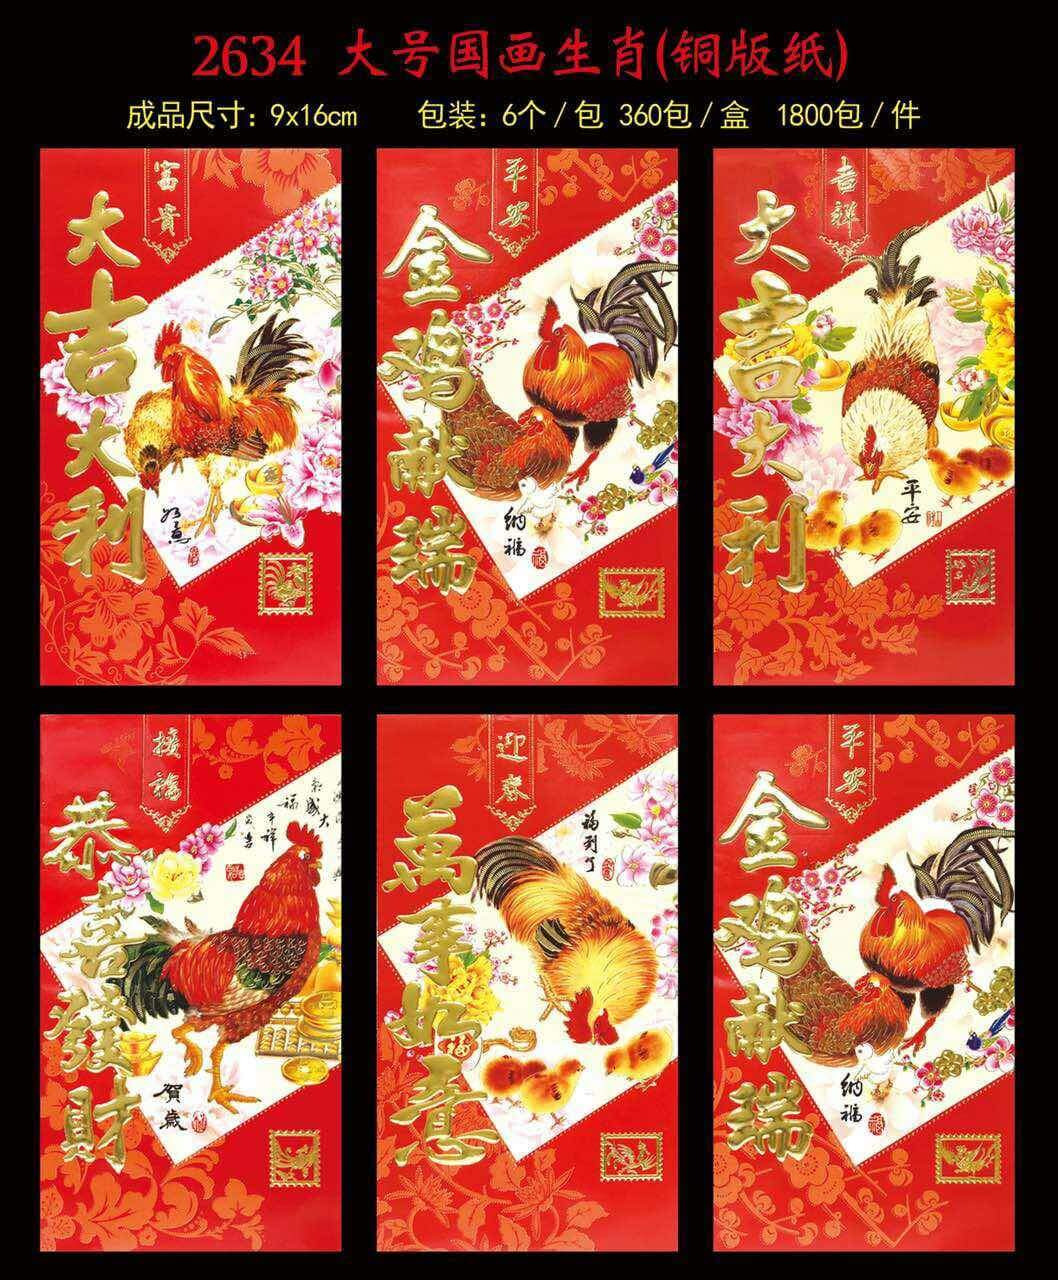 Jual Angpau Imlek 2634 Isi 6 Buah Tahun Ayam Angbao Angpao Ampau 1 Paket Murah Pusat Distributor Tokopedia